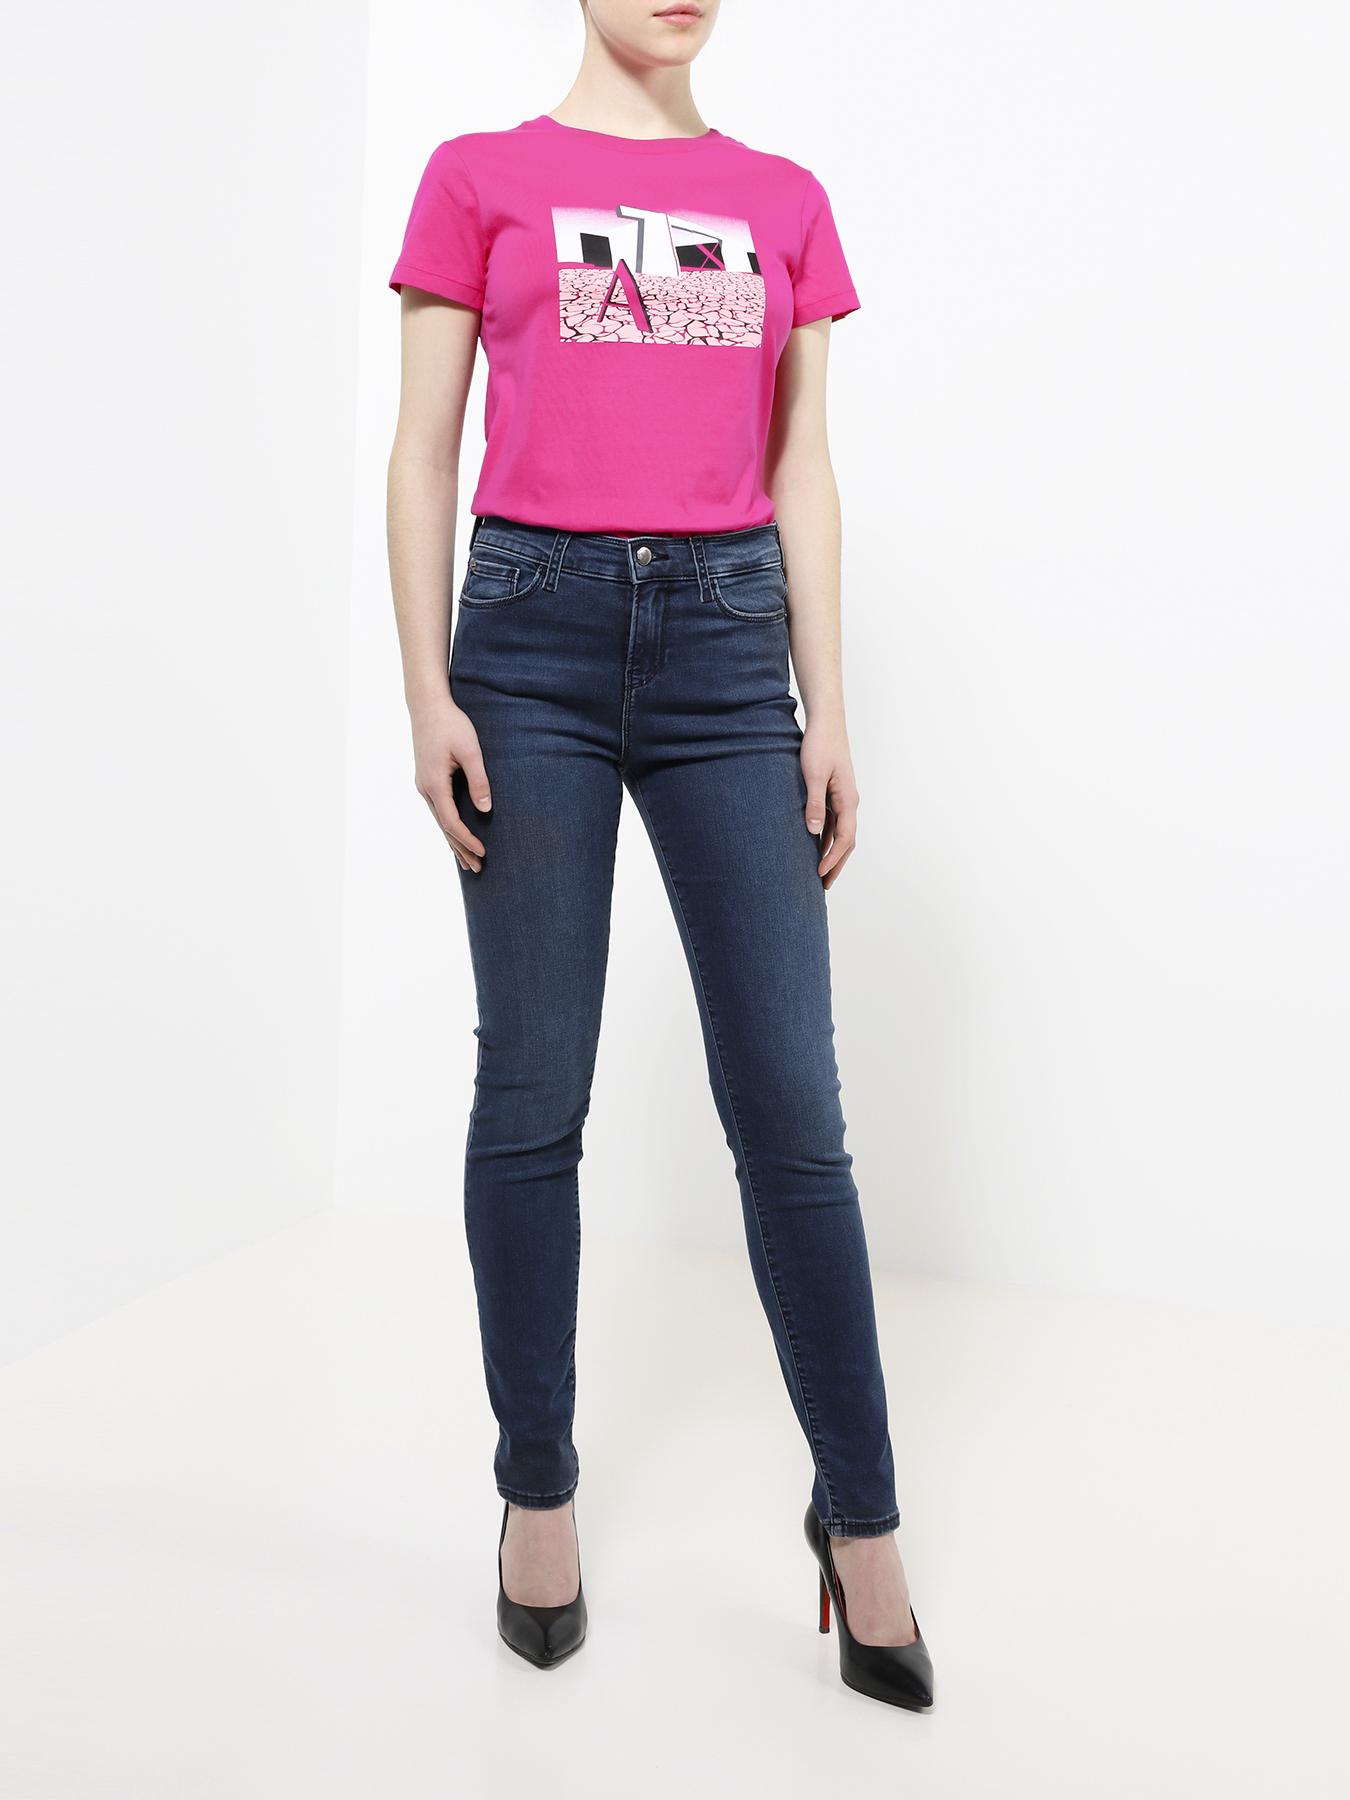 цена на Брюки Emporio Armani Узкие джинсы J20